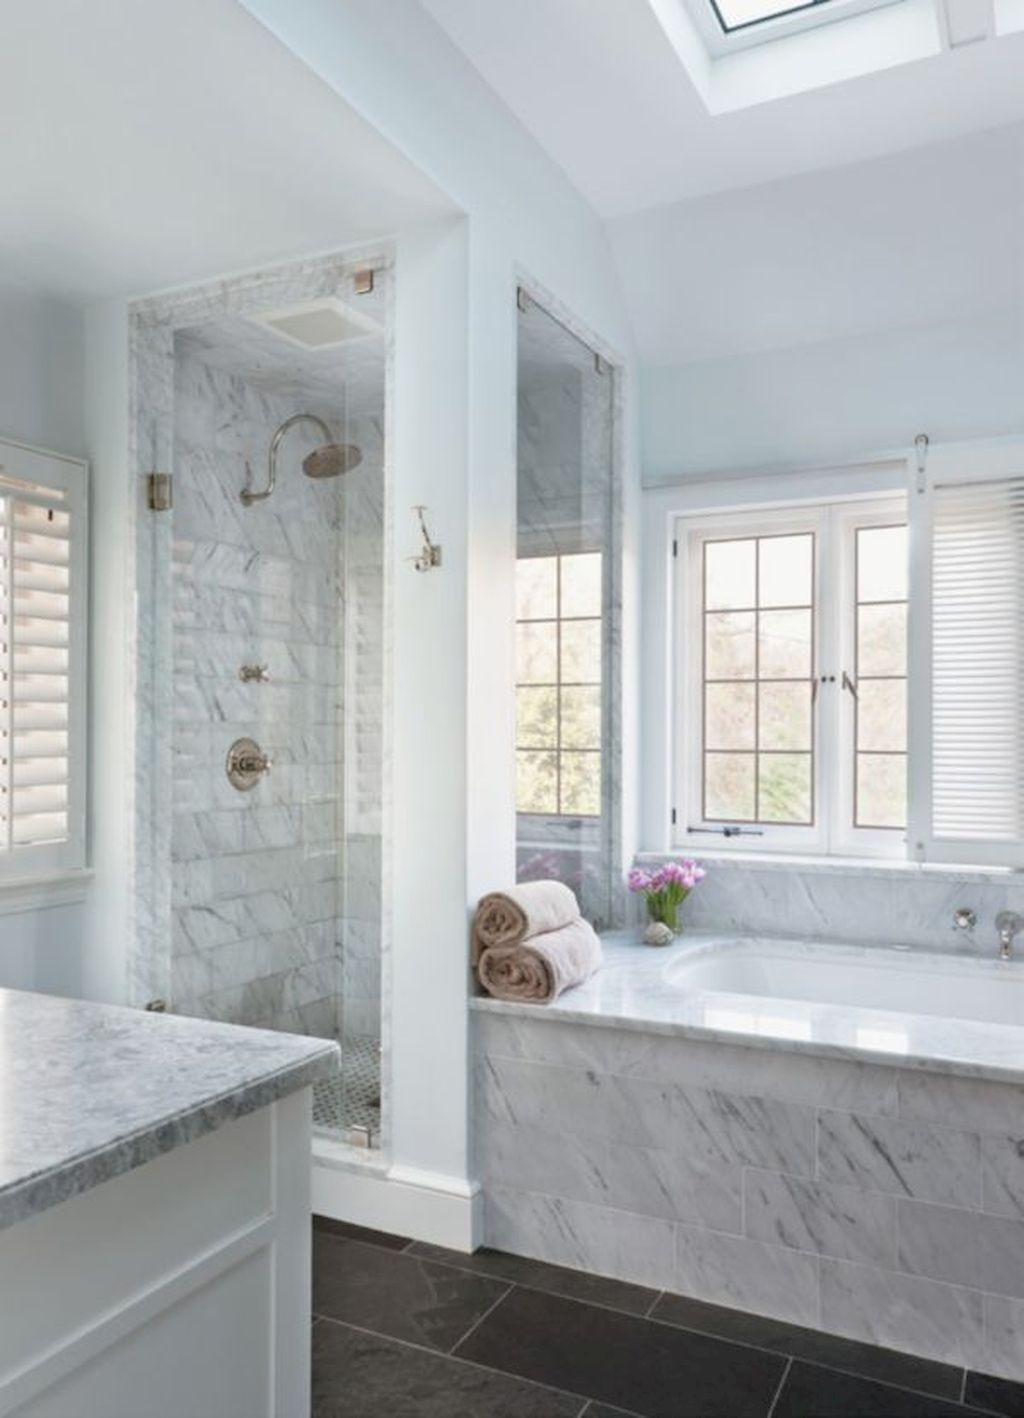 80 Beautiful Master Bathroom Ideas | Master bathrooms, Bath and House